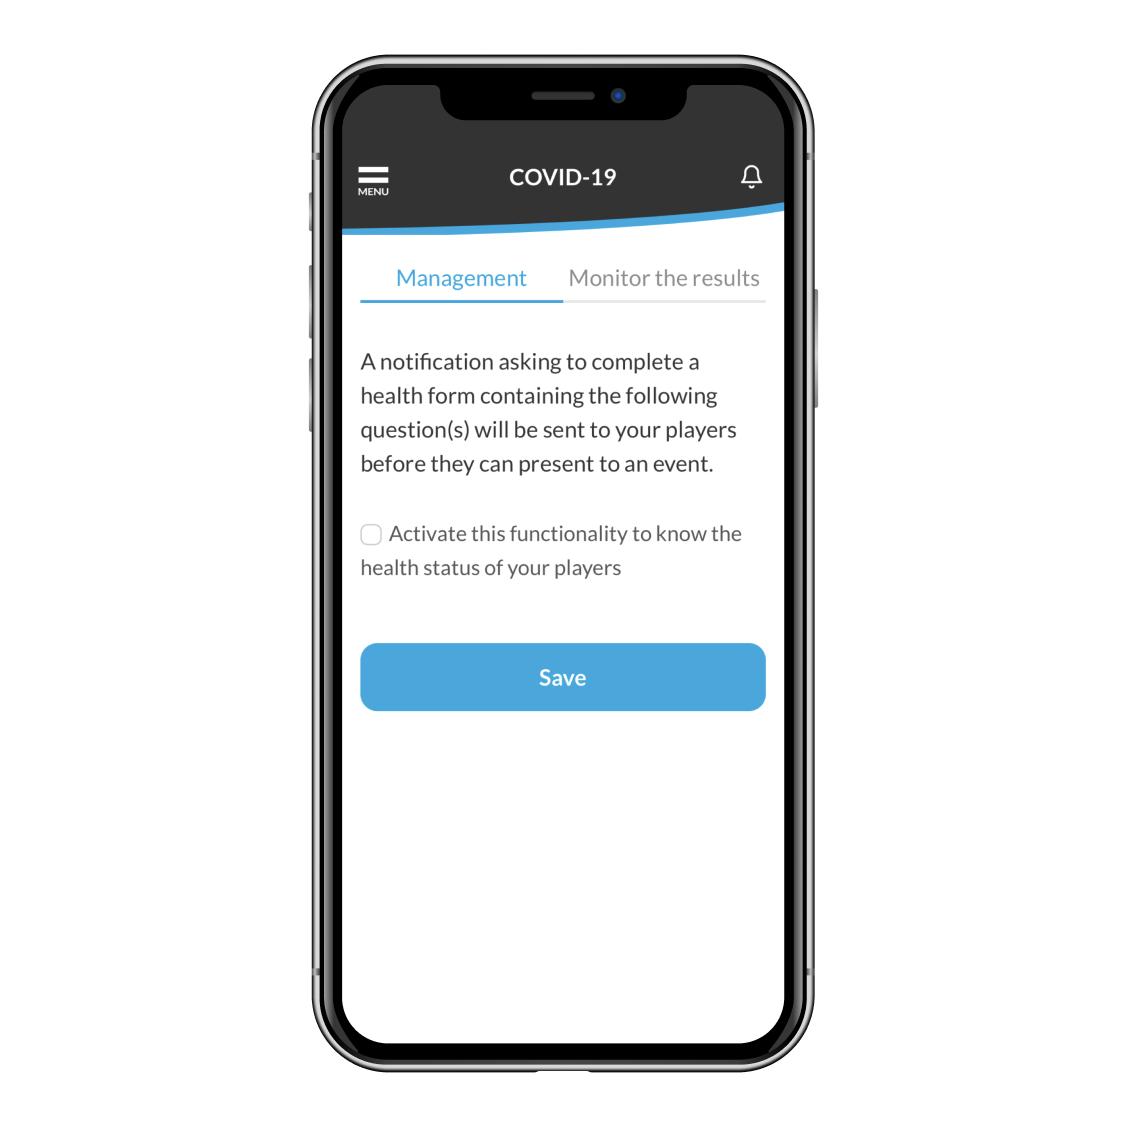 covid-19 health function on app